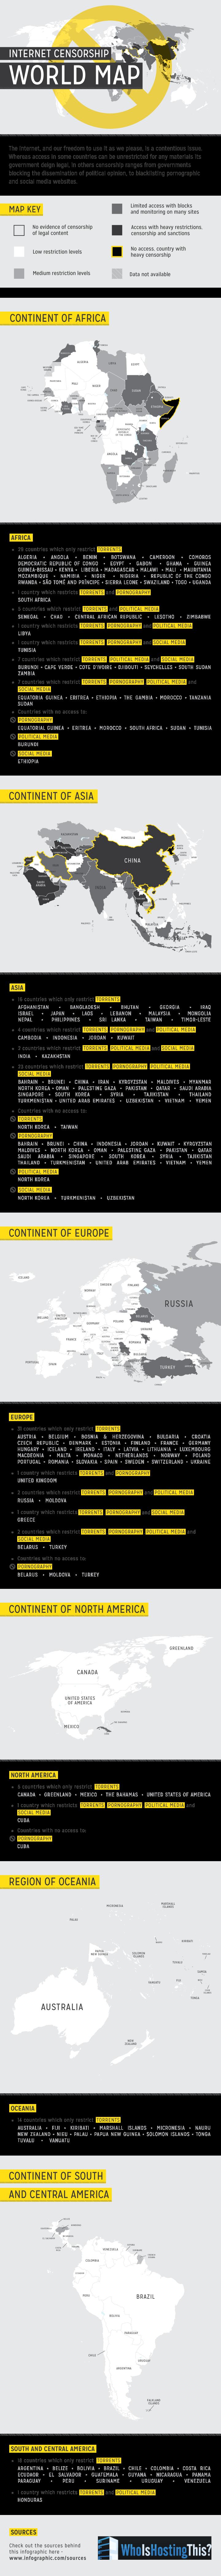 Atlas mundial de la censura en Internet